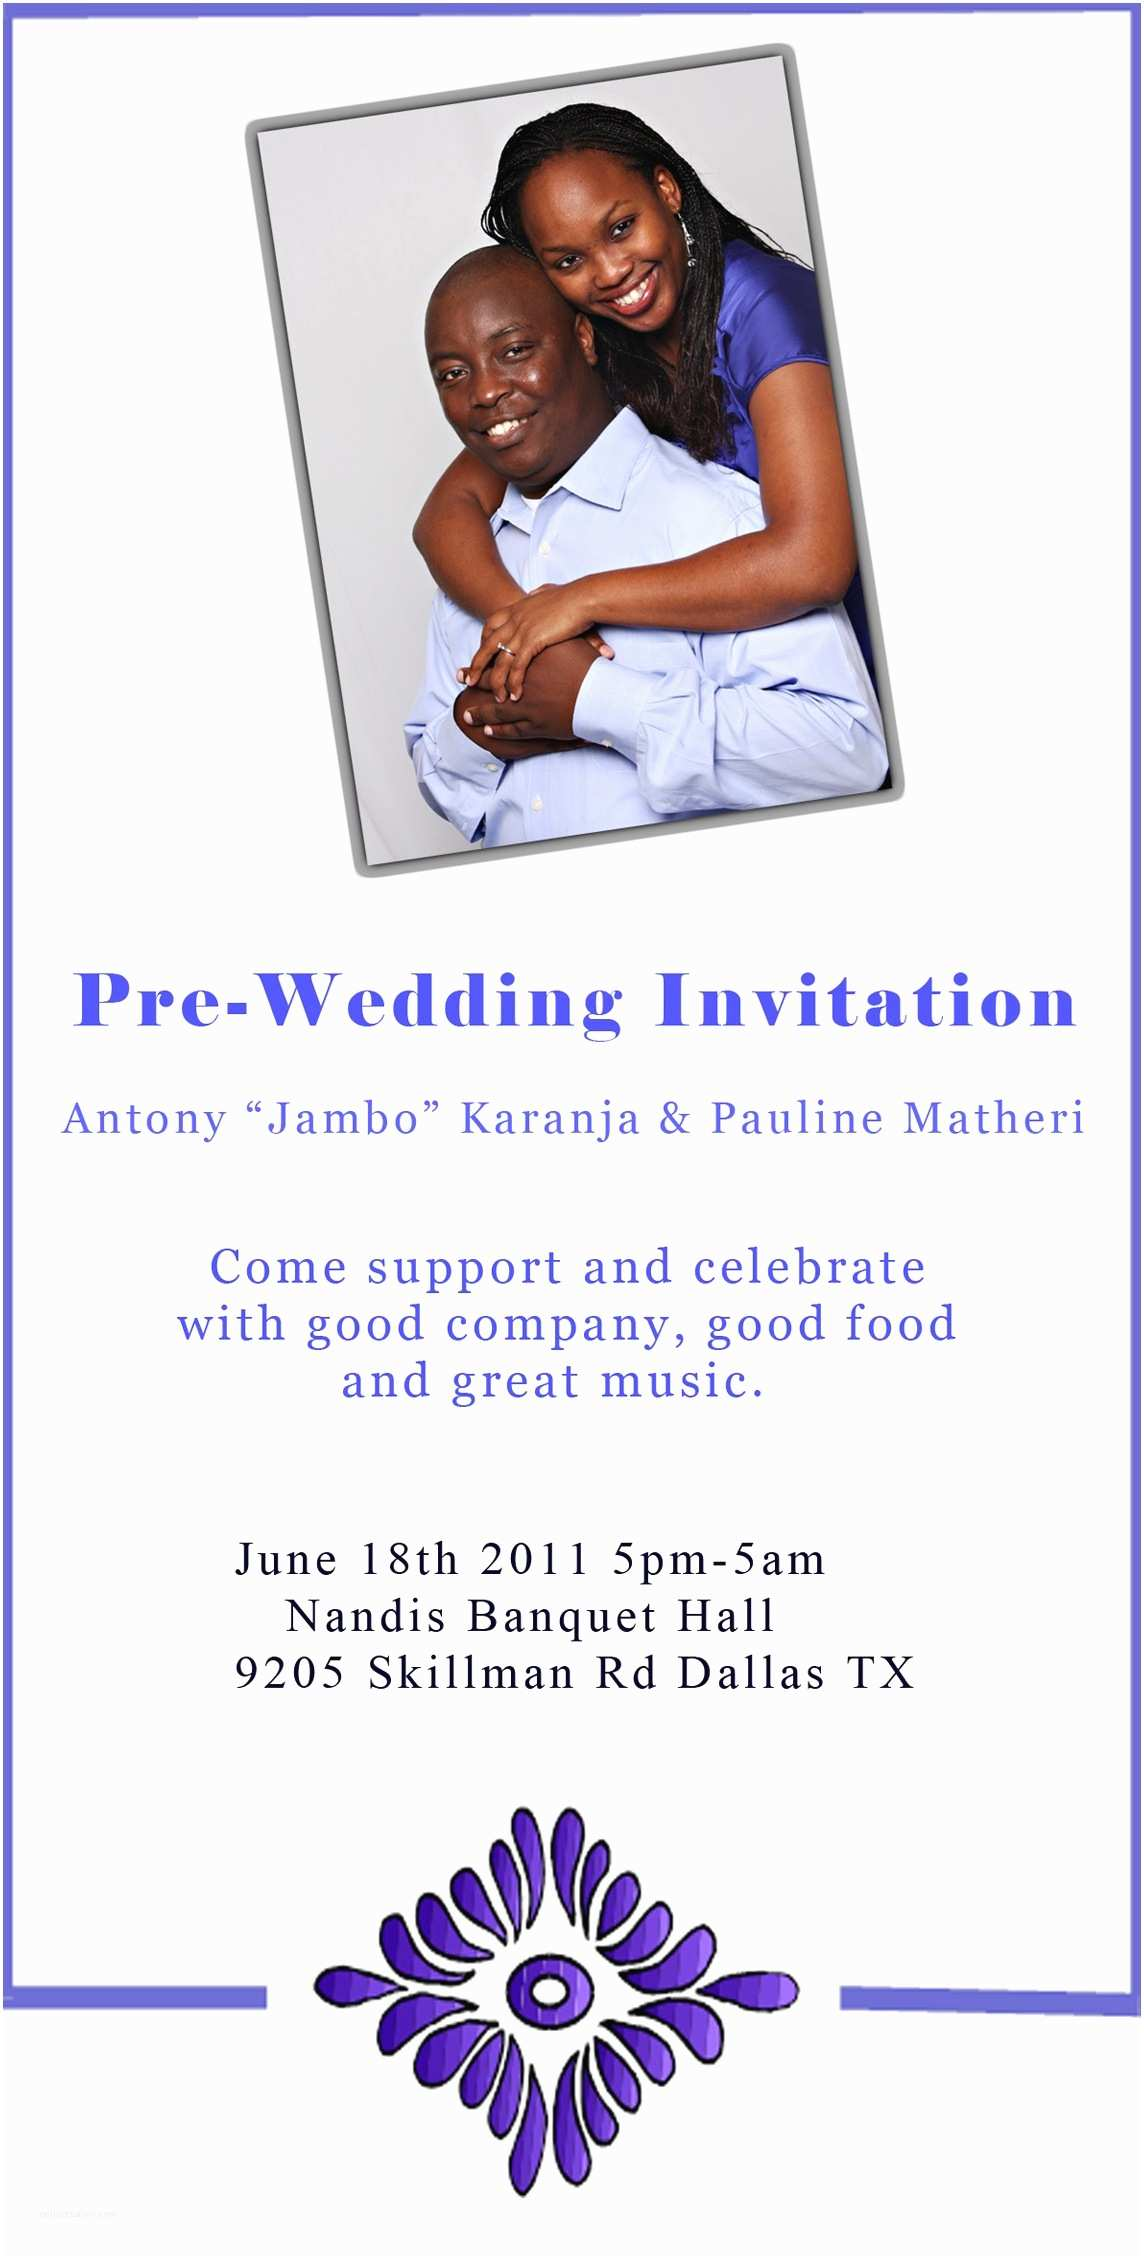 Pre Wedding Party Invitation Invitation From the Wedding Mittee Antony Jambo